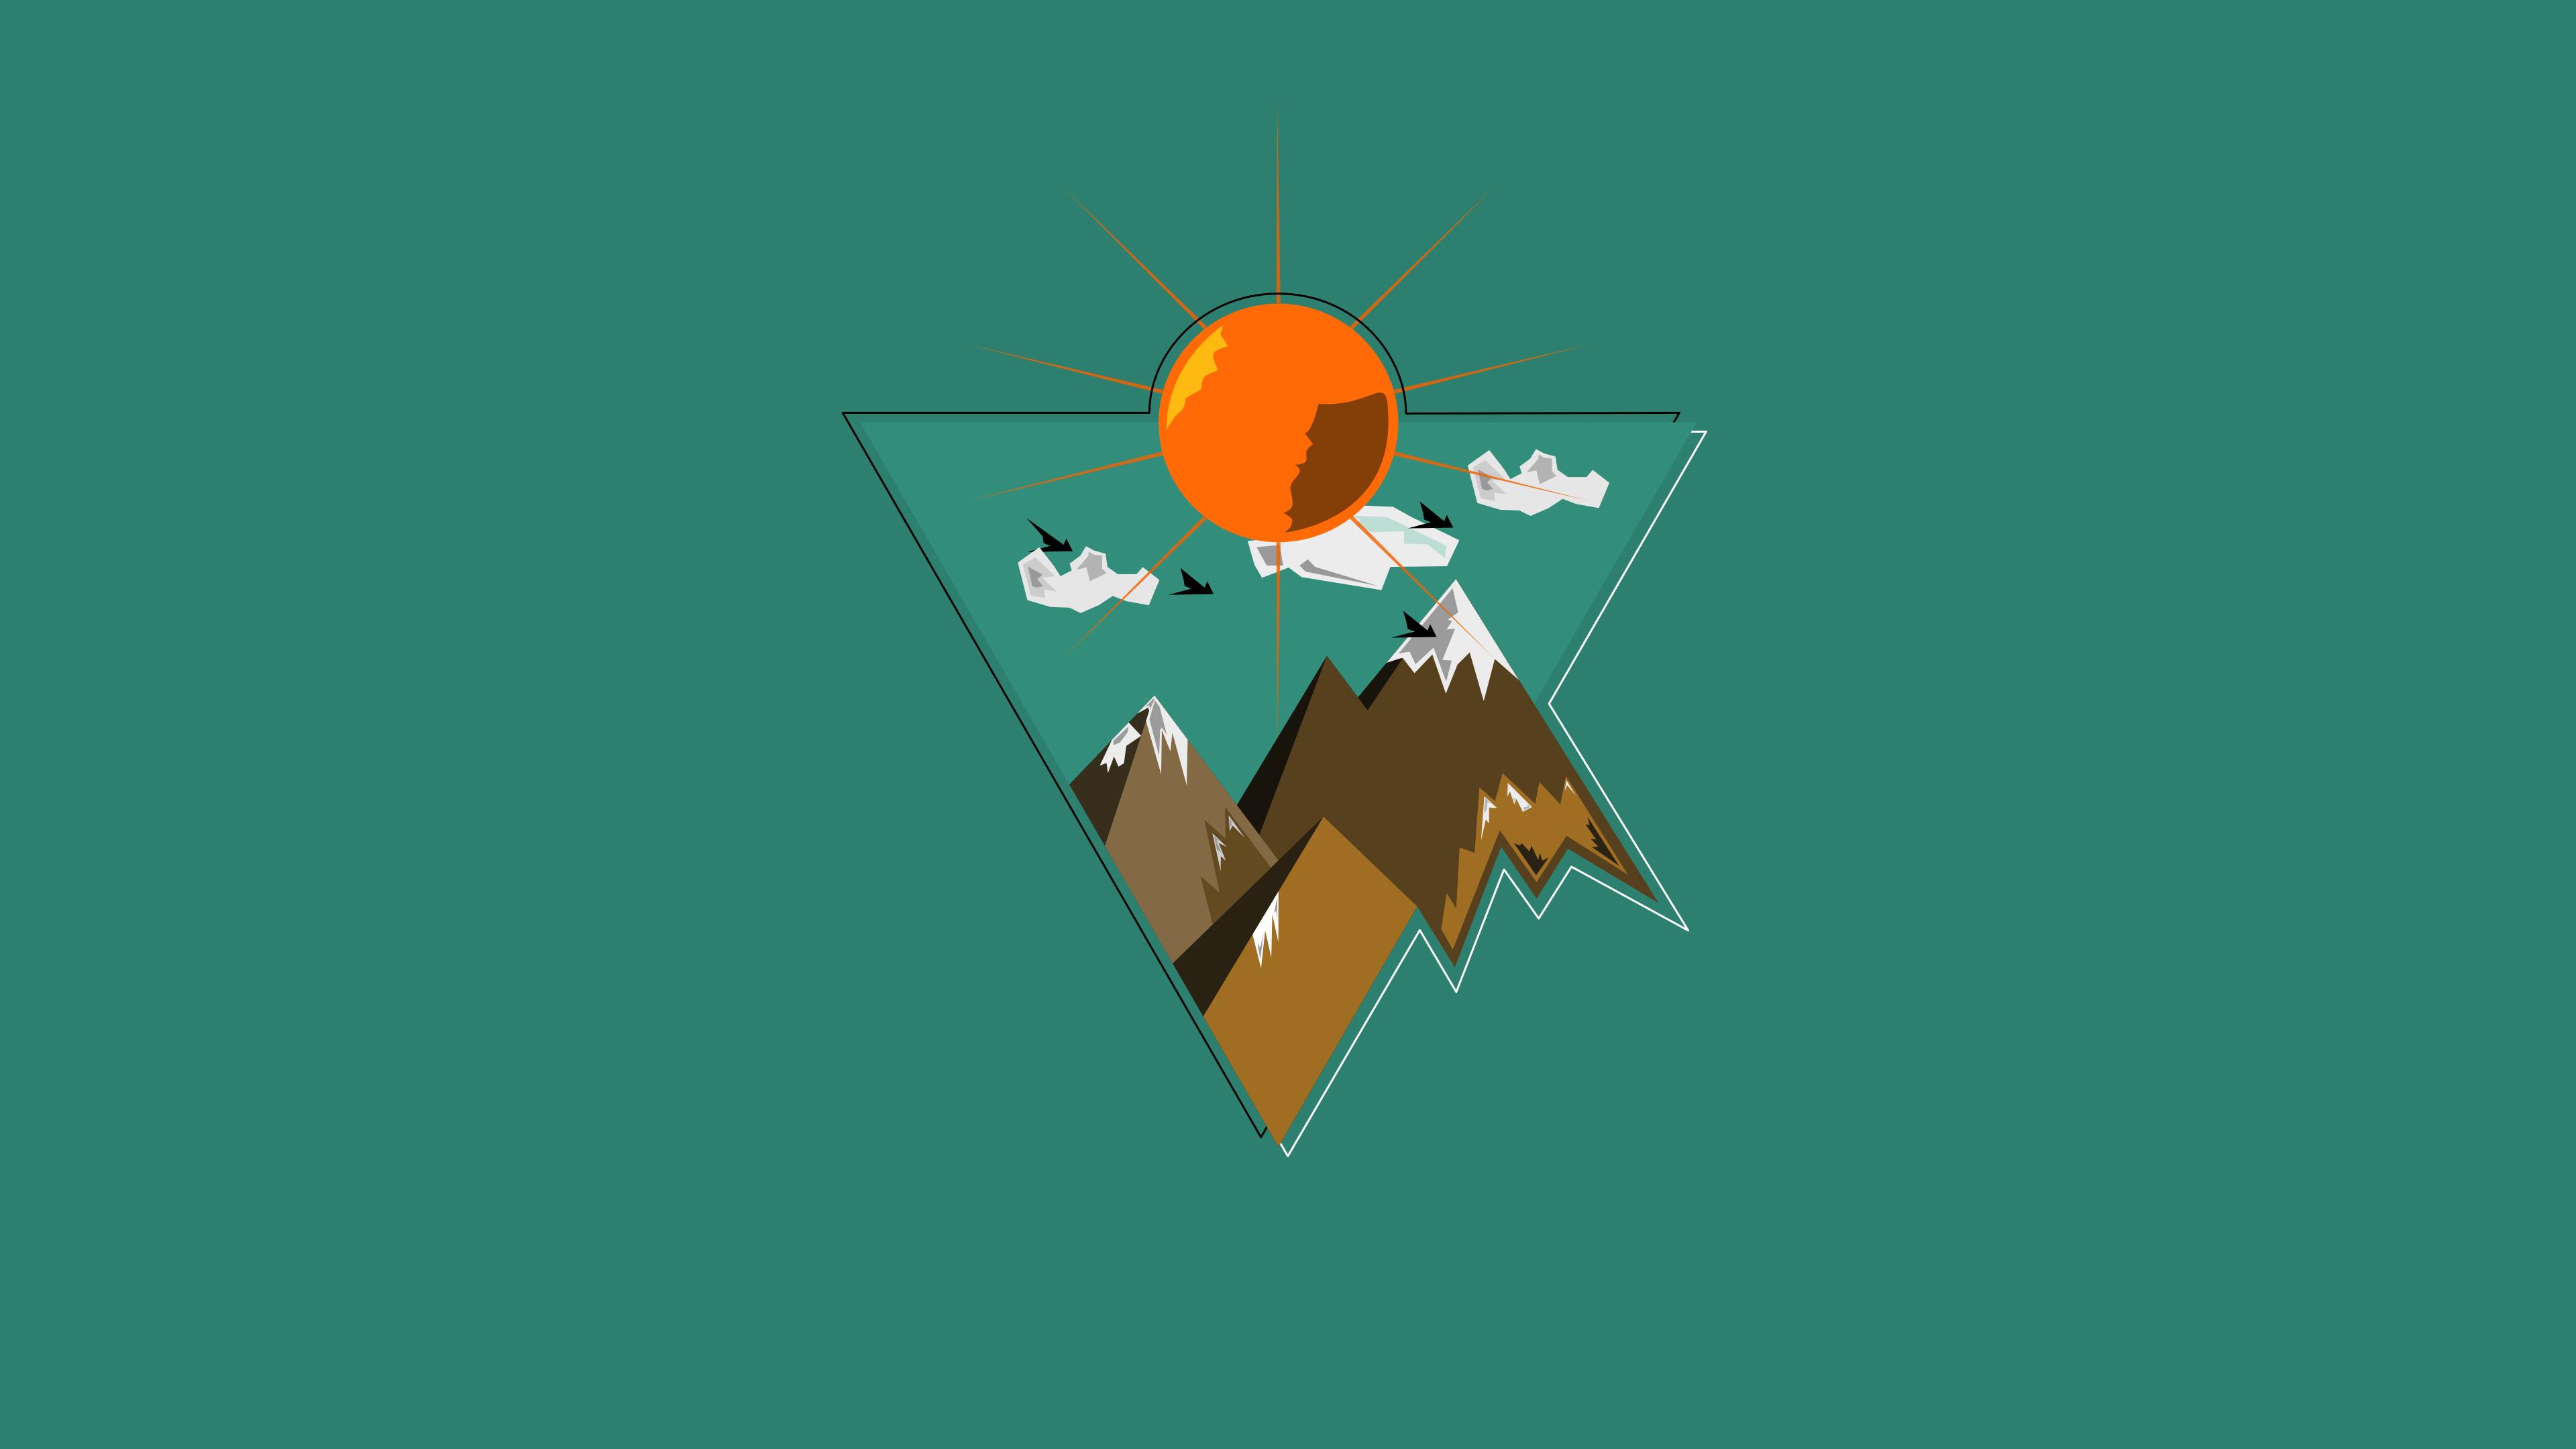 mountains sunset minimal triangle 1578254983 - Mountains Sunset Minimal Triangle -